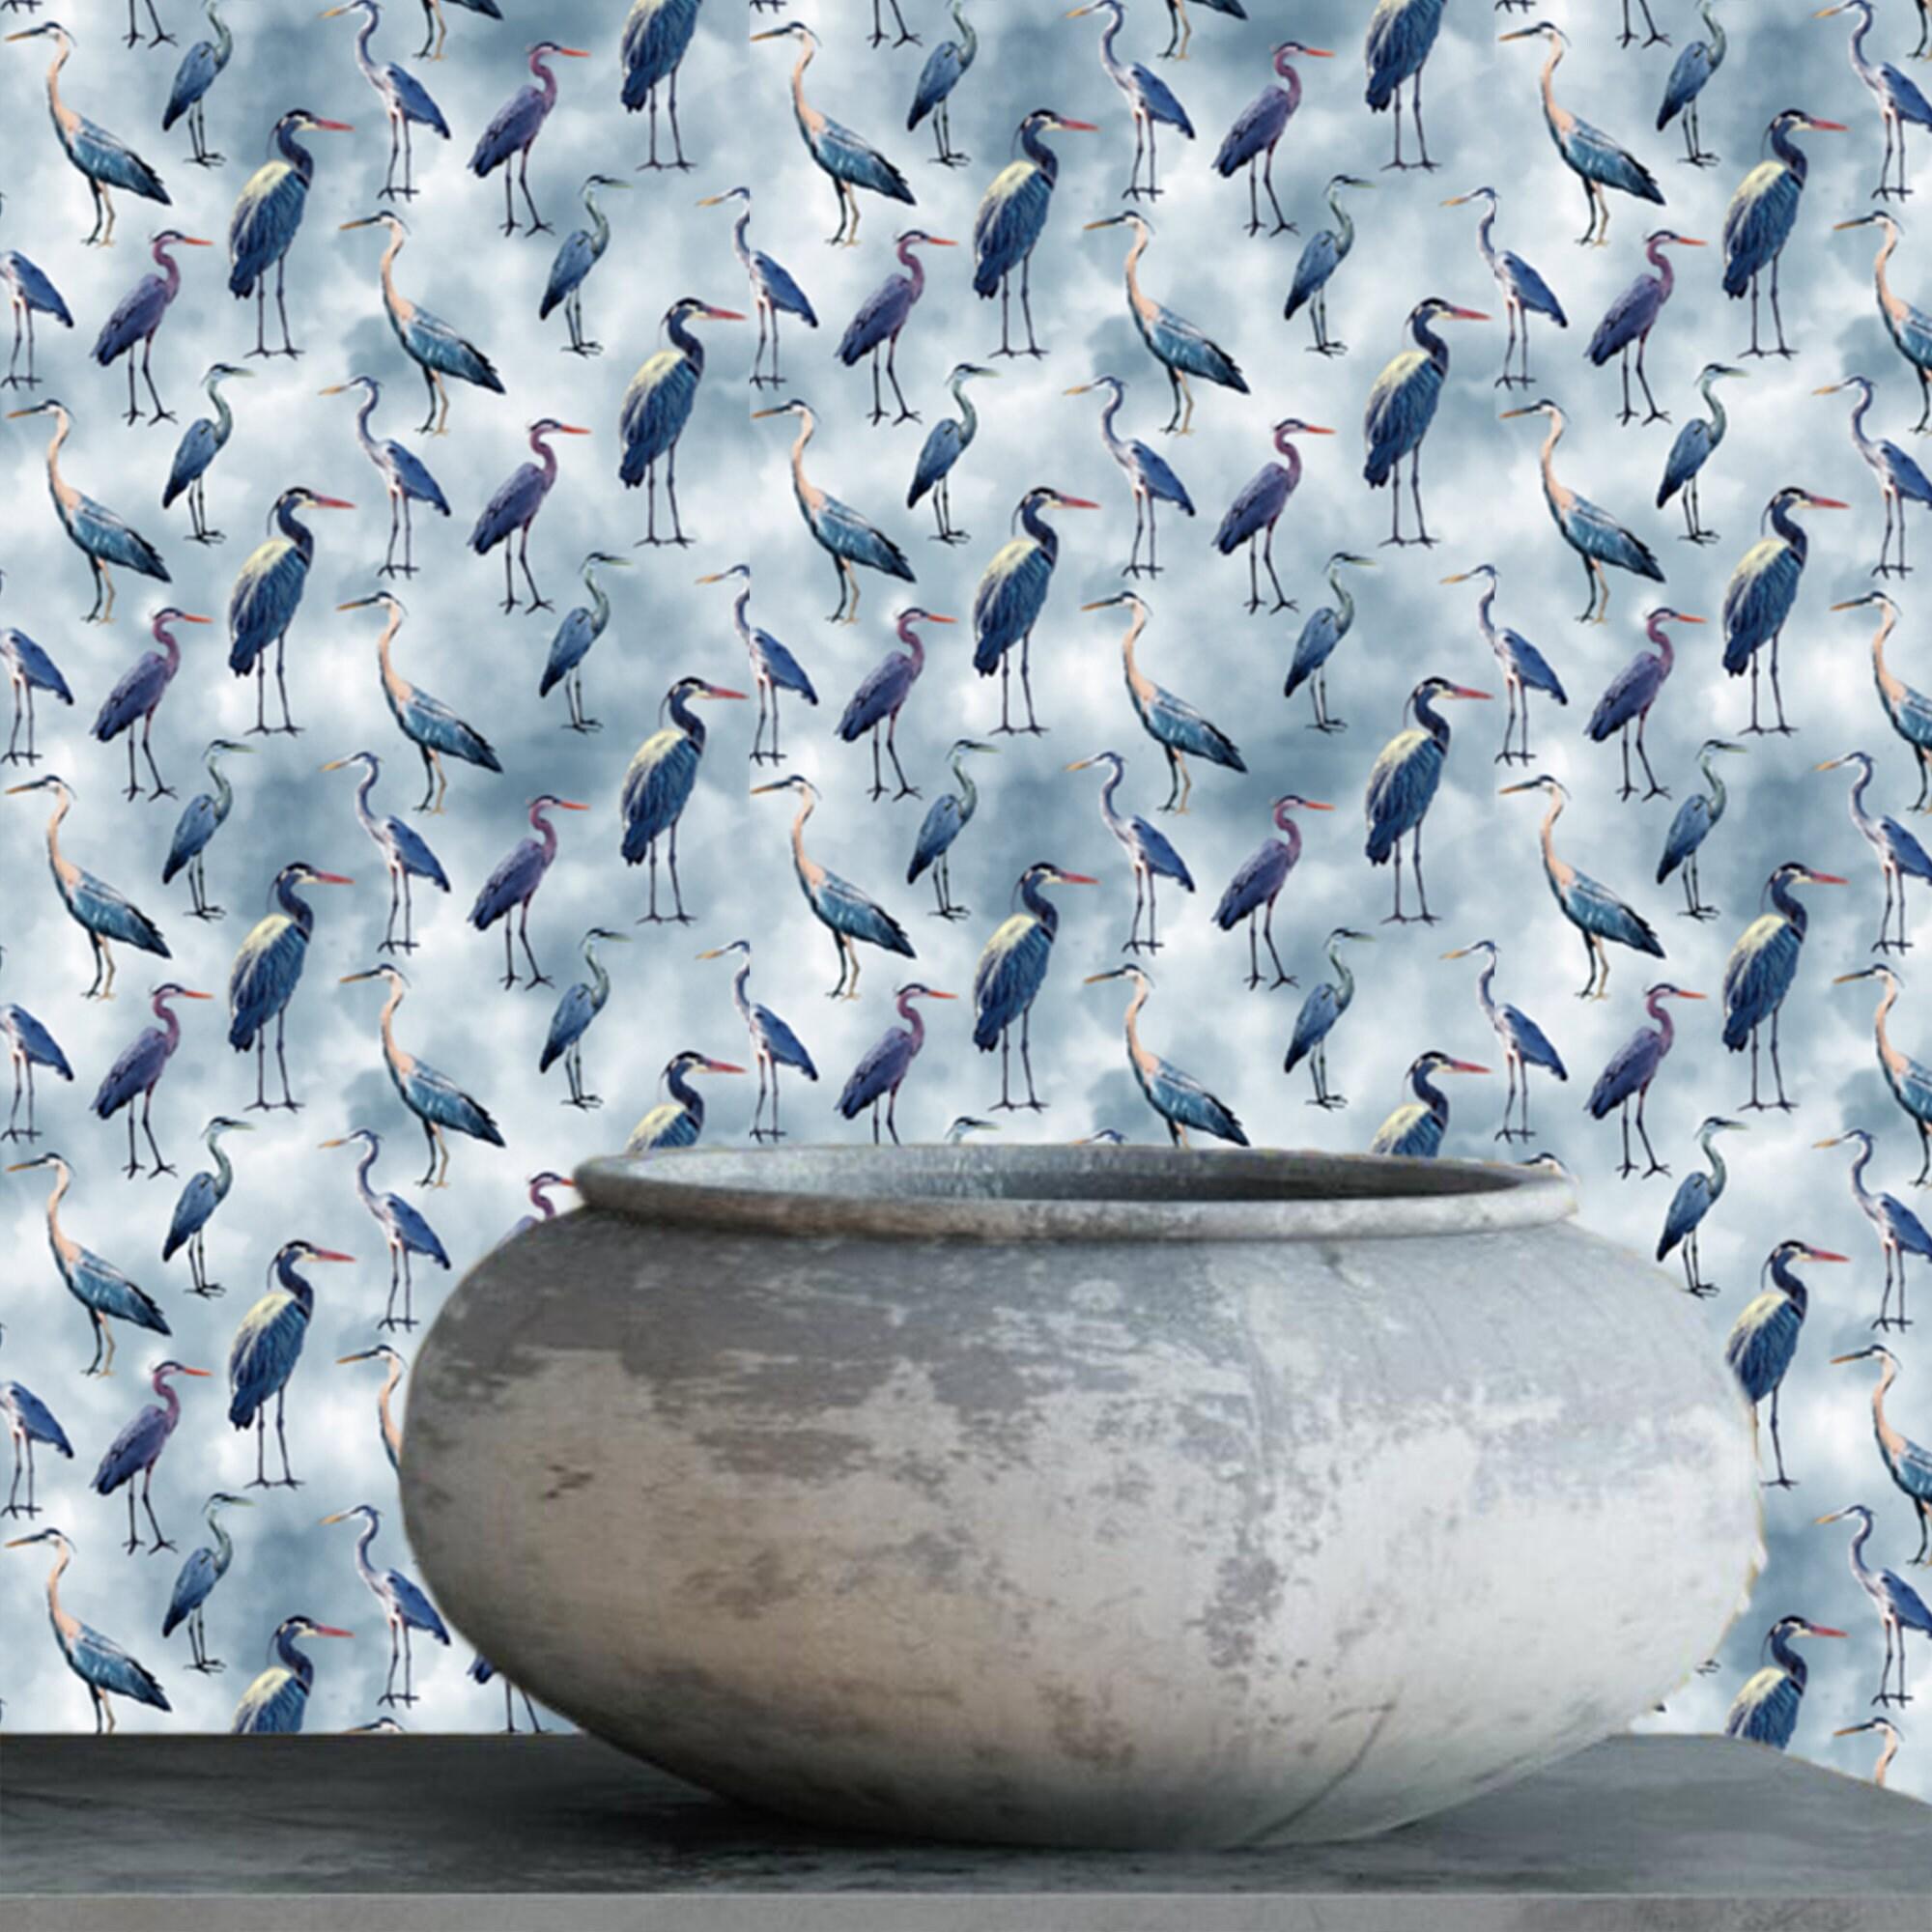 Blue Herons Animal Print Wallpaper Removable Abstract Wallpaper Peel And Stick Wallpaper Blue Herons Wallpaper Self Adhesive Wallpaper